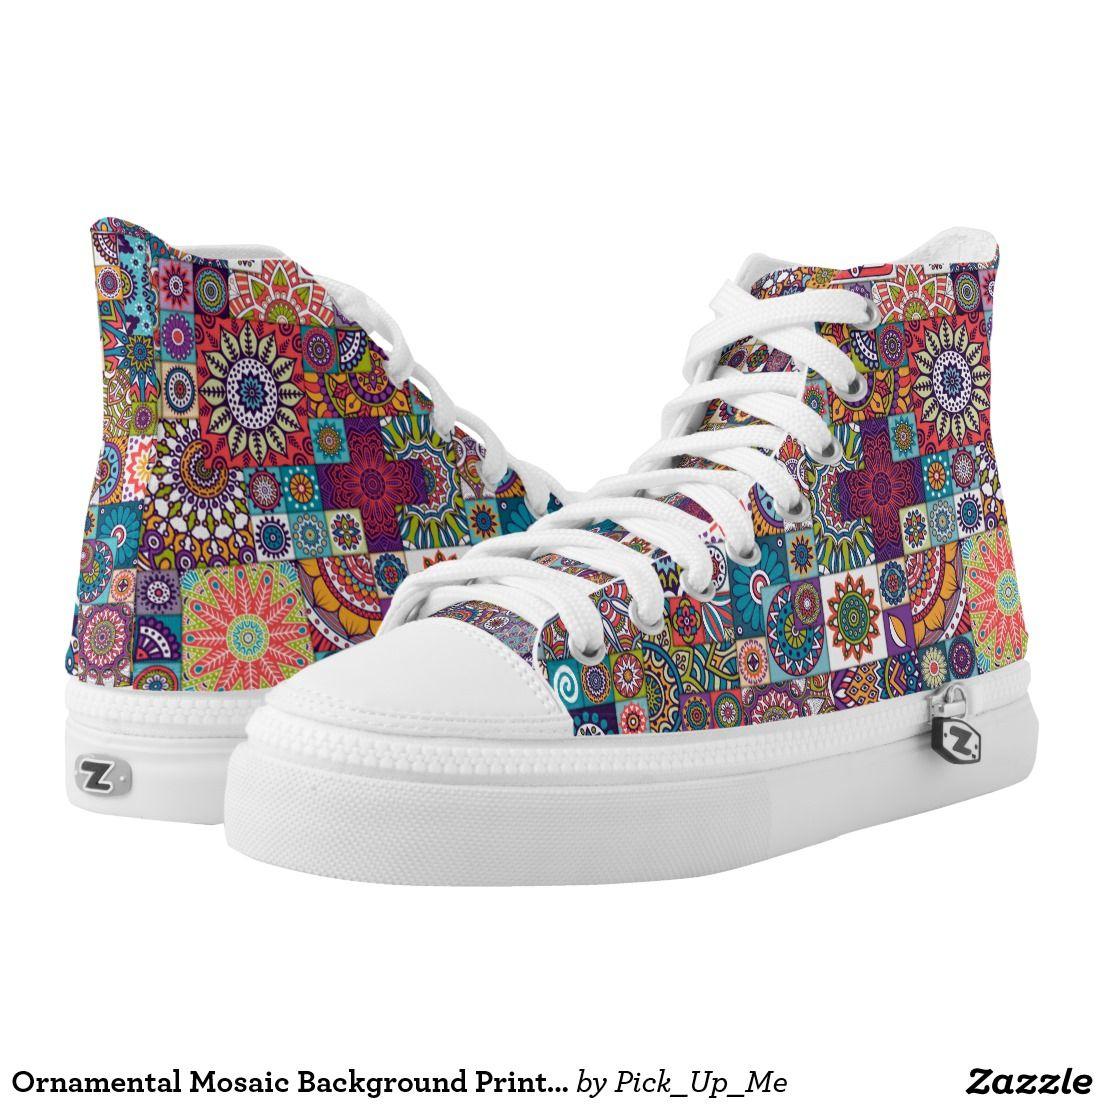 a93b00ba7f9 Ornamental mosaic background printed shoes tennis shoes converse jpg  1104x1104 Mosaic print shoes